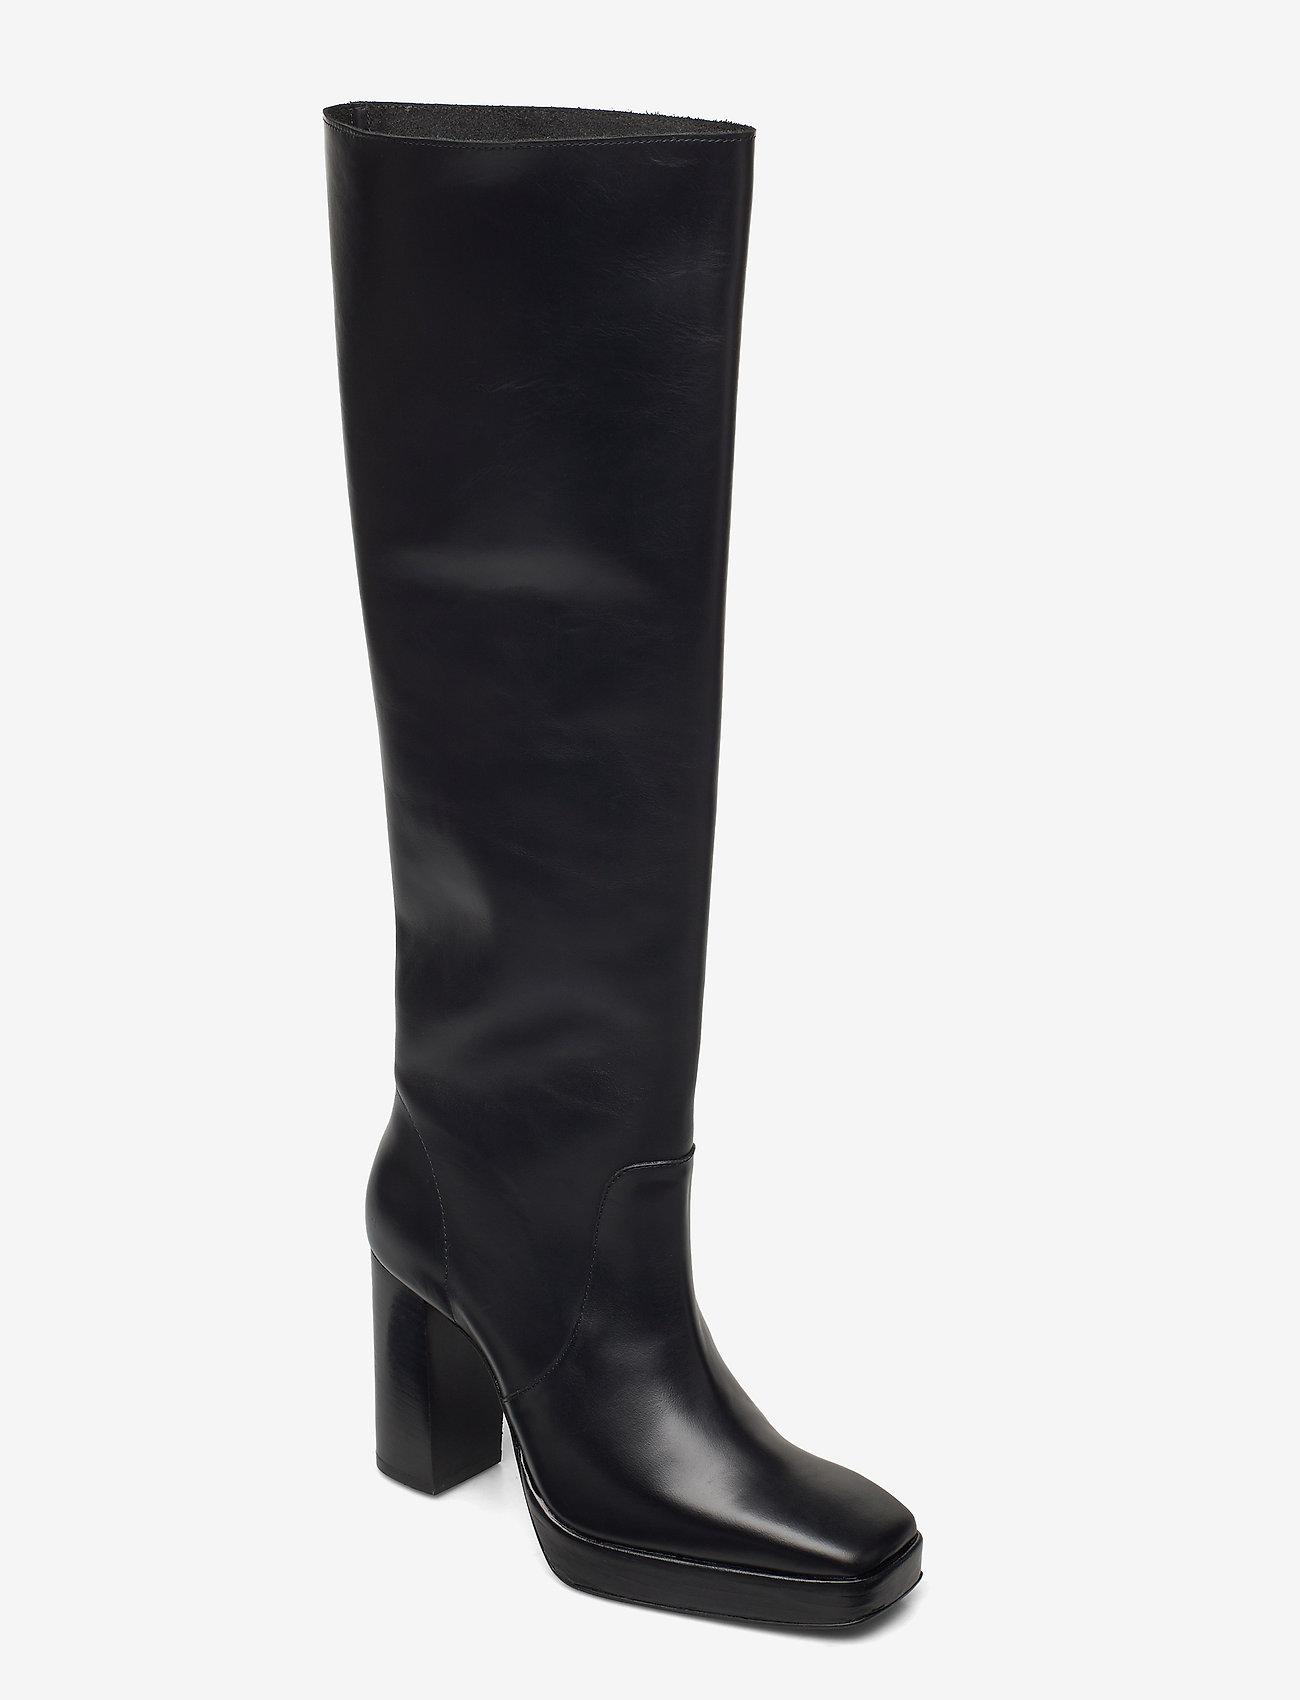 ANNY NORD - CLOSER TO HEAVEN Tall boot - lange laarzen - black - 0